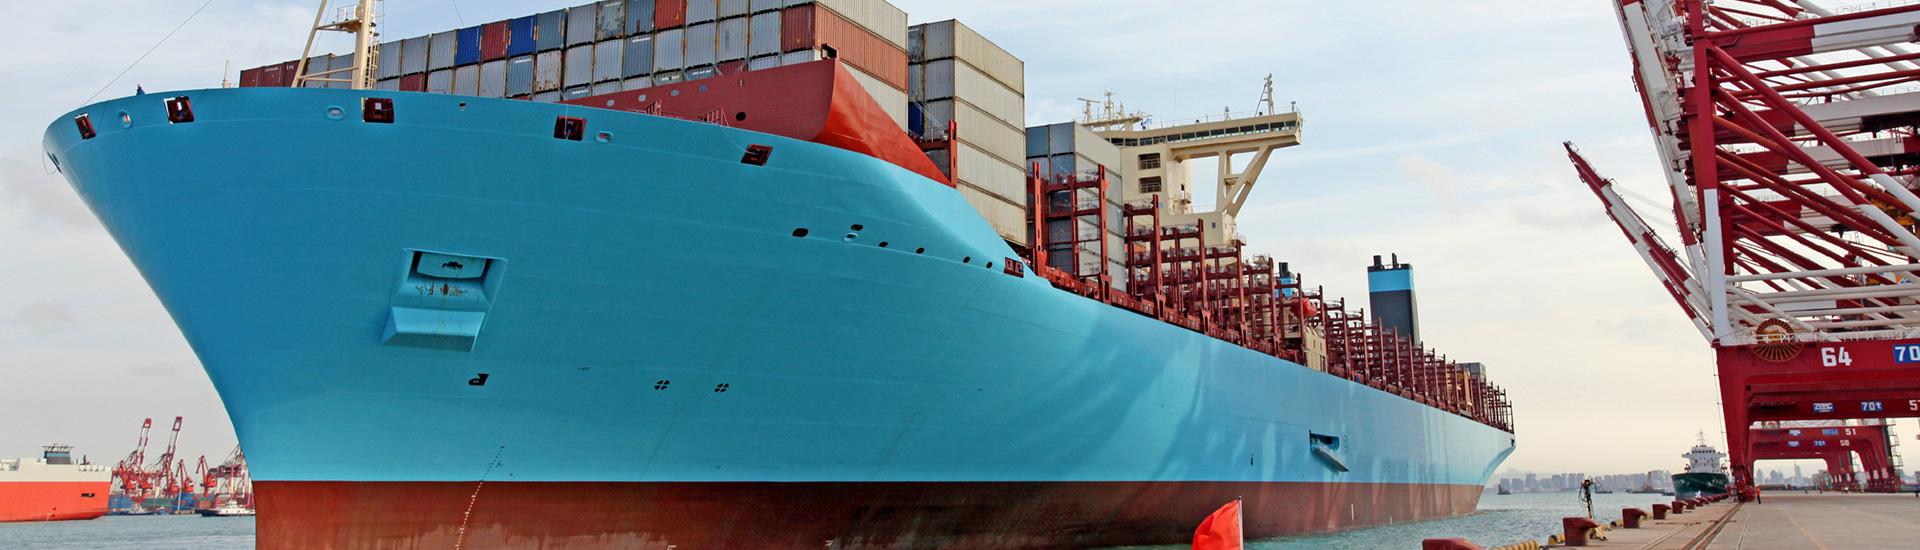 Ship-iStock